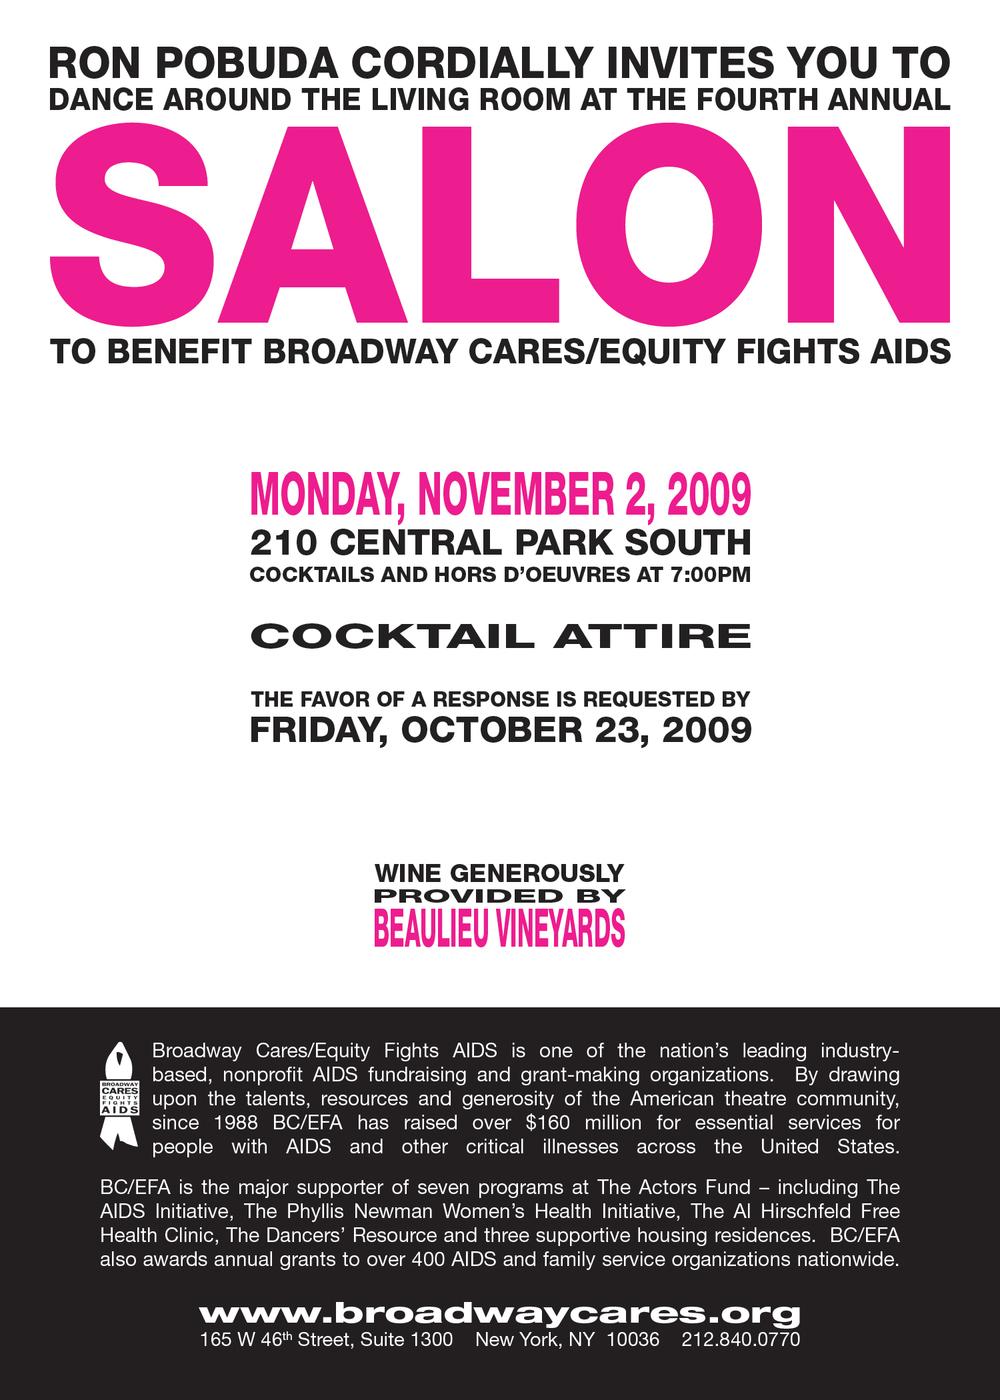 Salon 2009 Invitation - Card 01 - Back